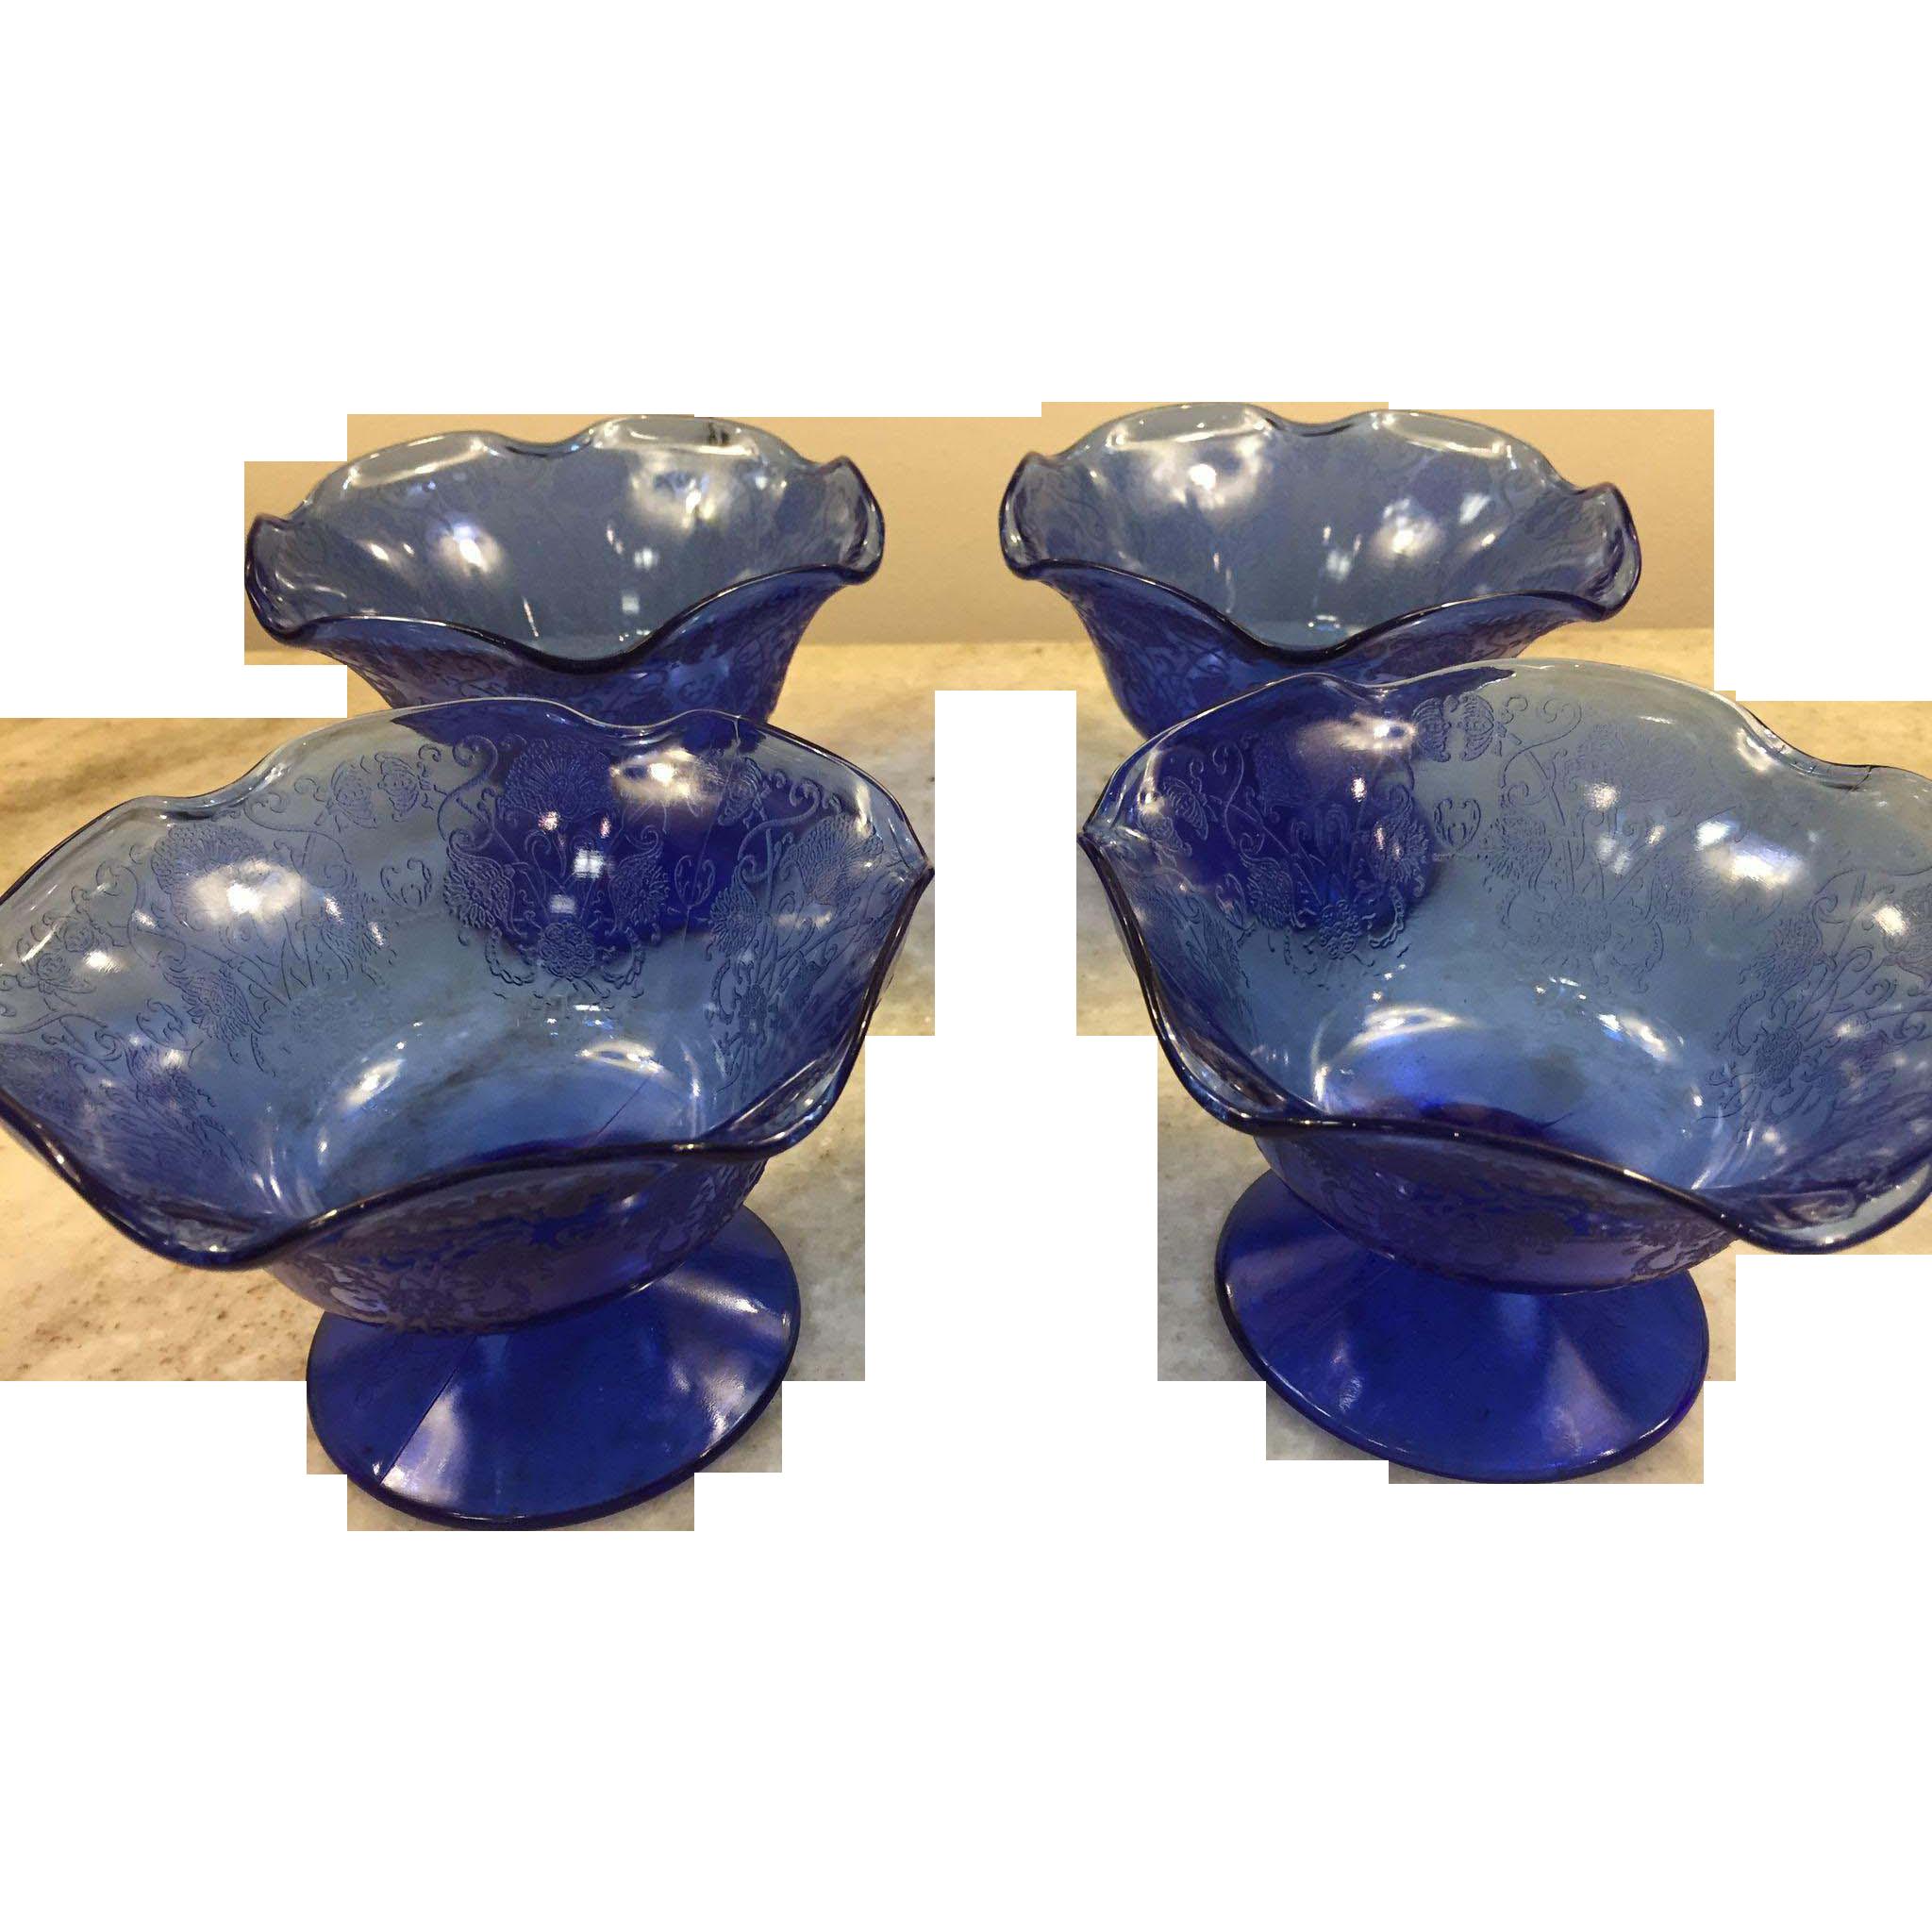 Set of 4 Florentine Poppy #1 Cobalt Blue Ruffled Comports 1932-1935 Depression Glass